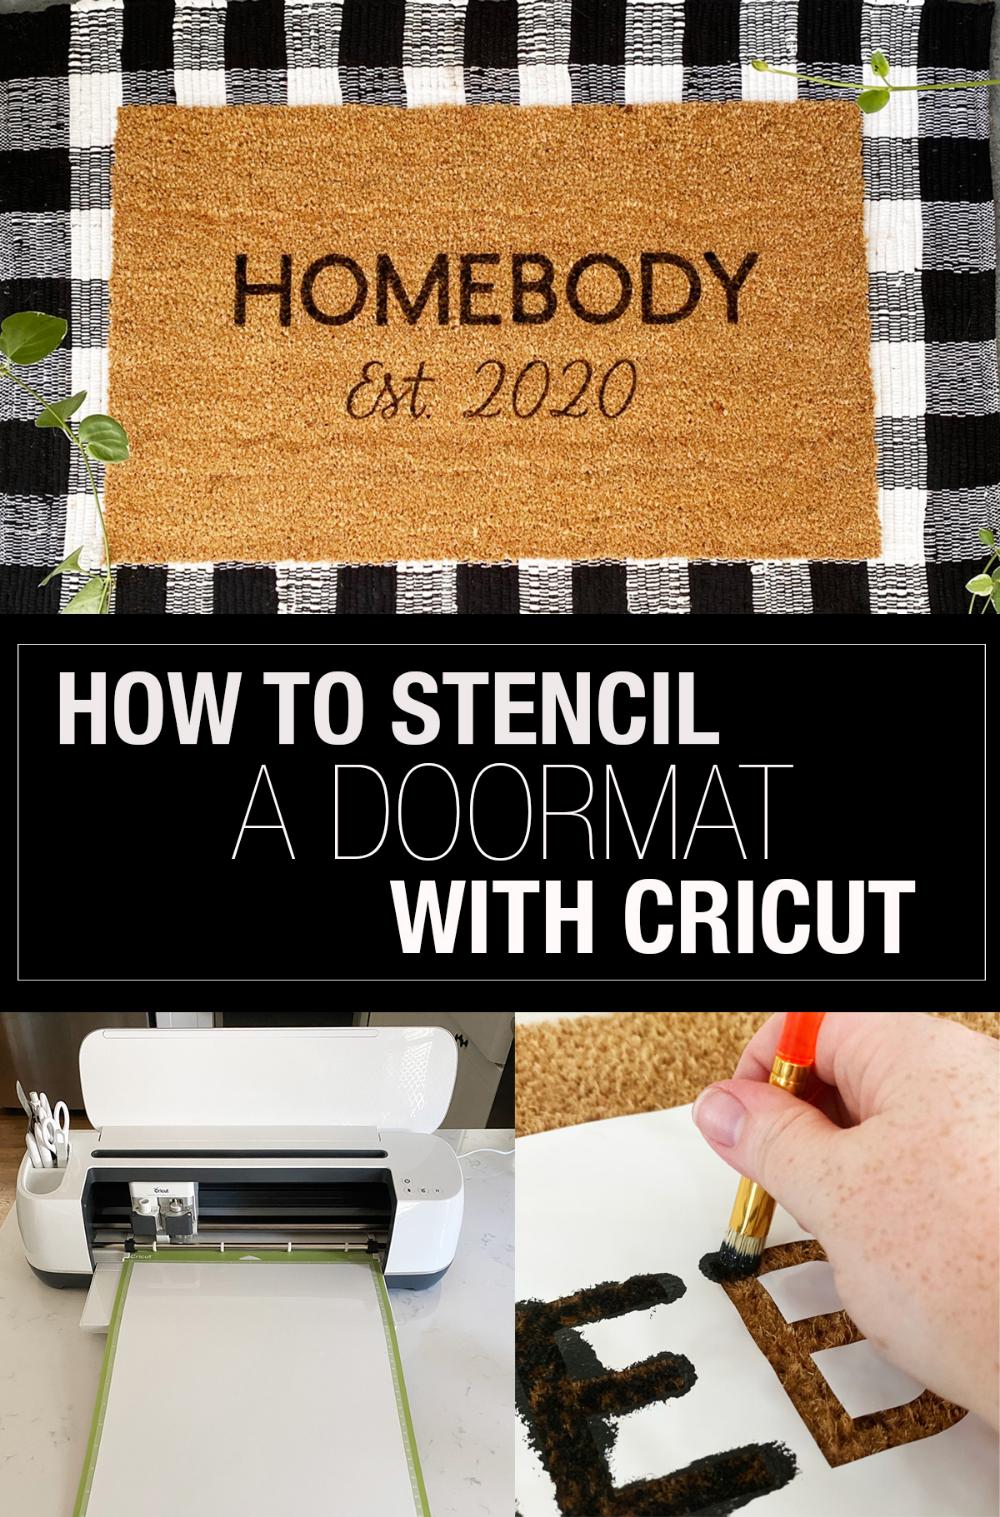 Ad Use Your Cricut To Create A Vinyl Stencil To Paint A Custom Doormat An Easy Diy Doormat Tutorial To Make This Homebod In 2020 Stencil Diy Cricut Stencils Door Mat